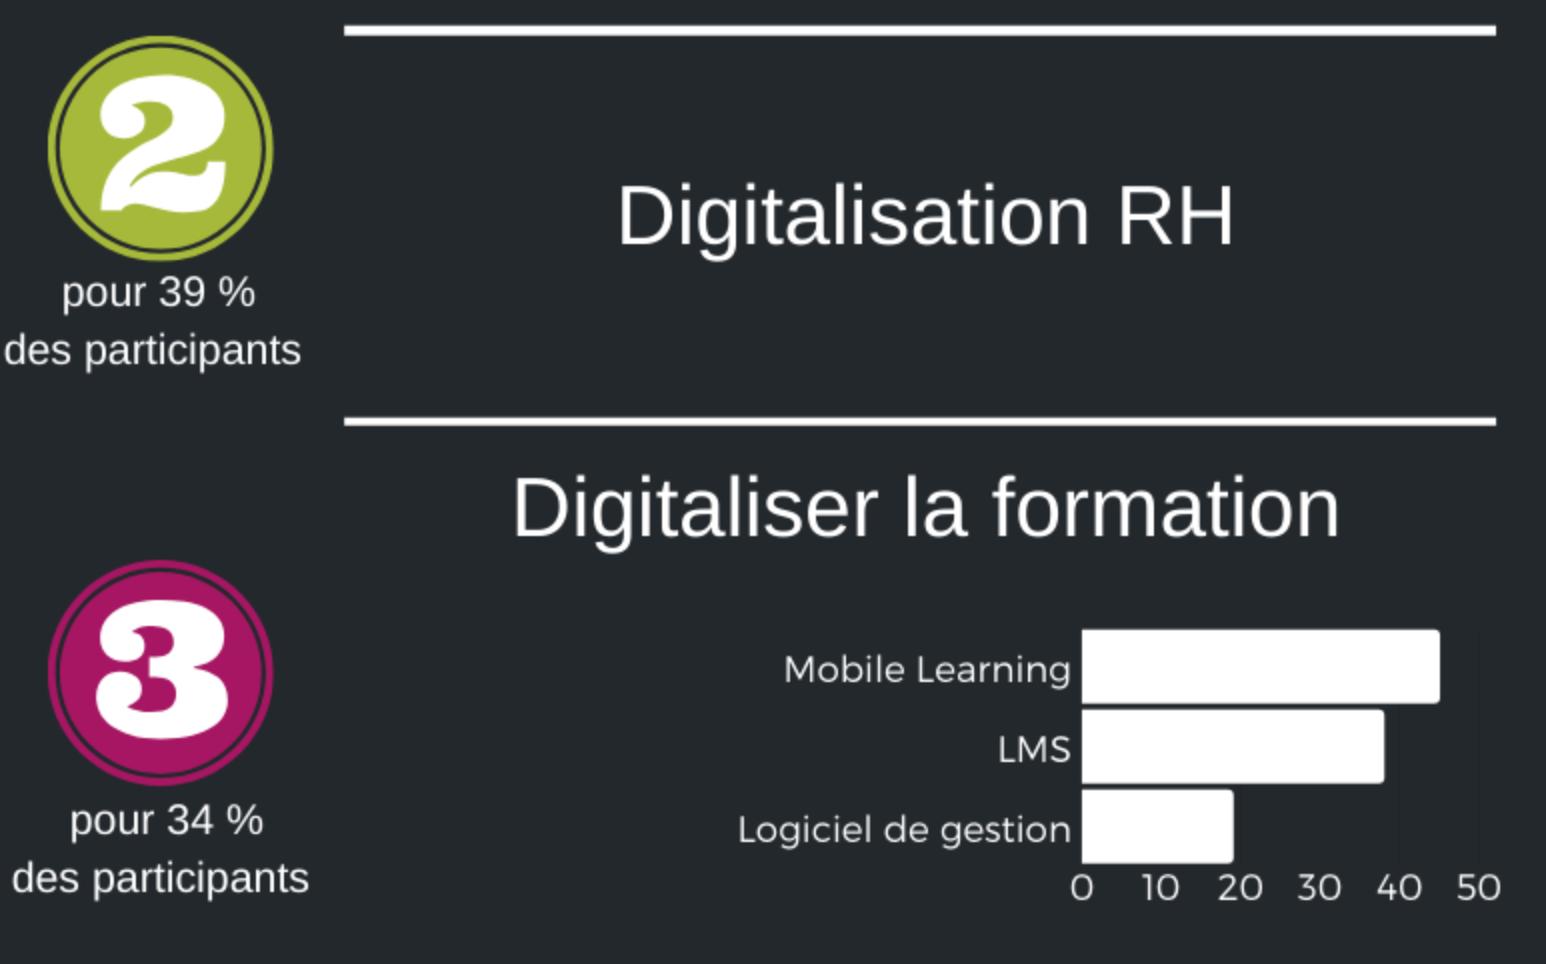 Digitalisation fonction RH